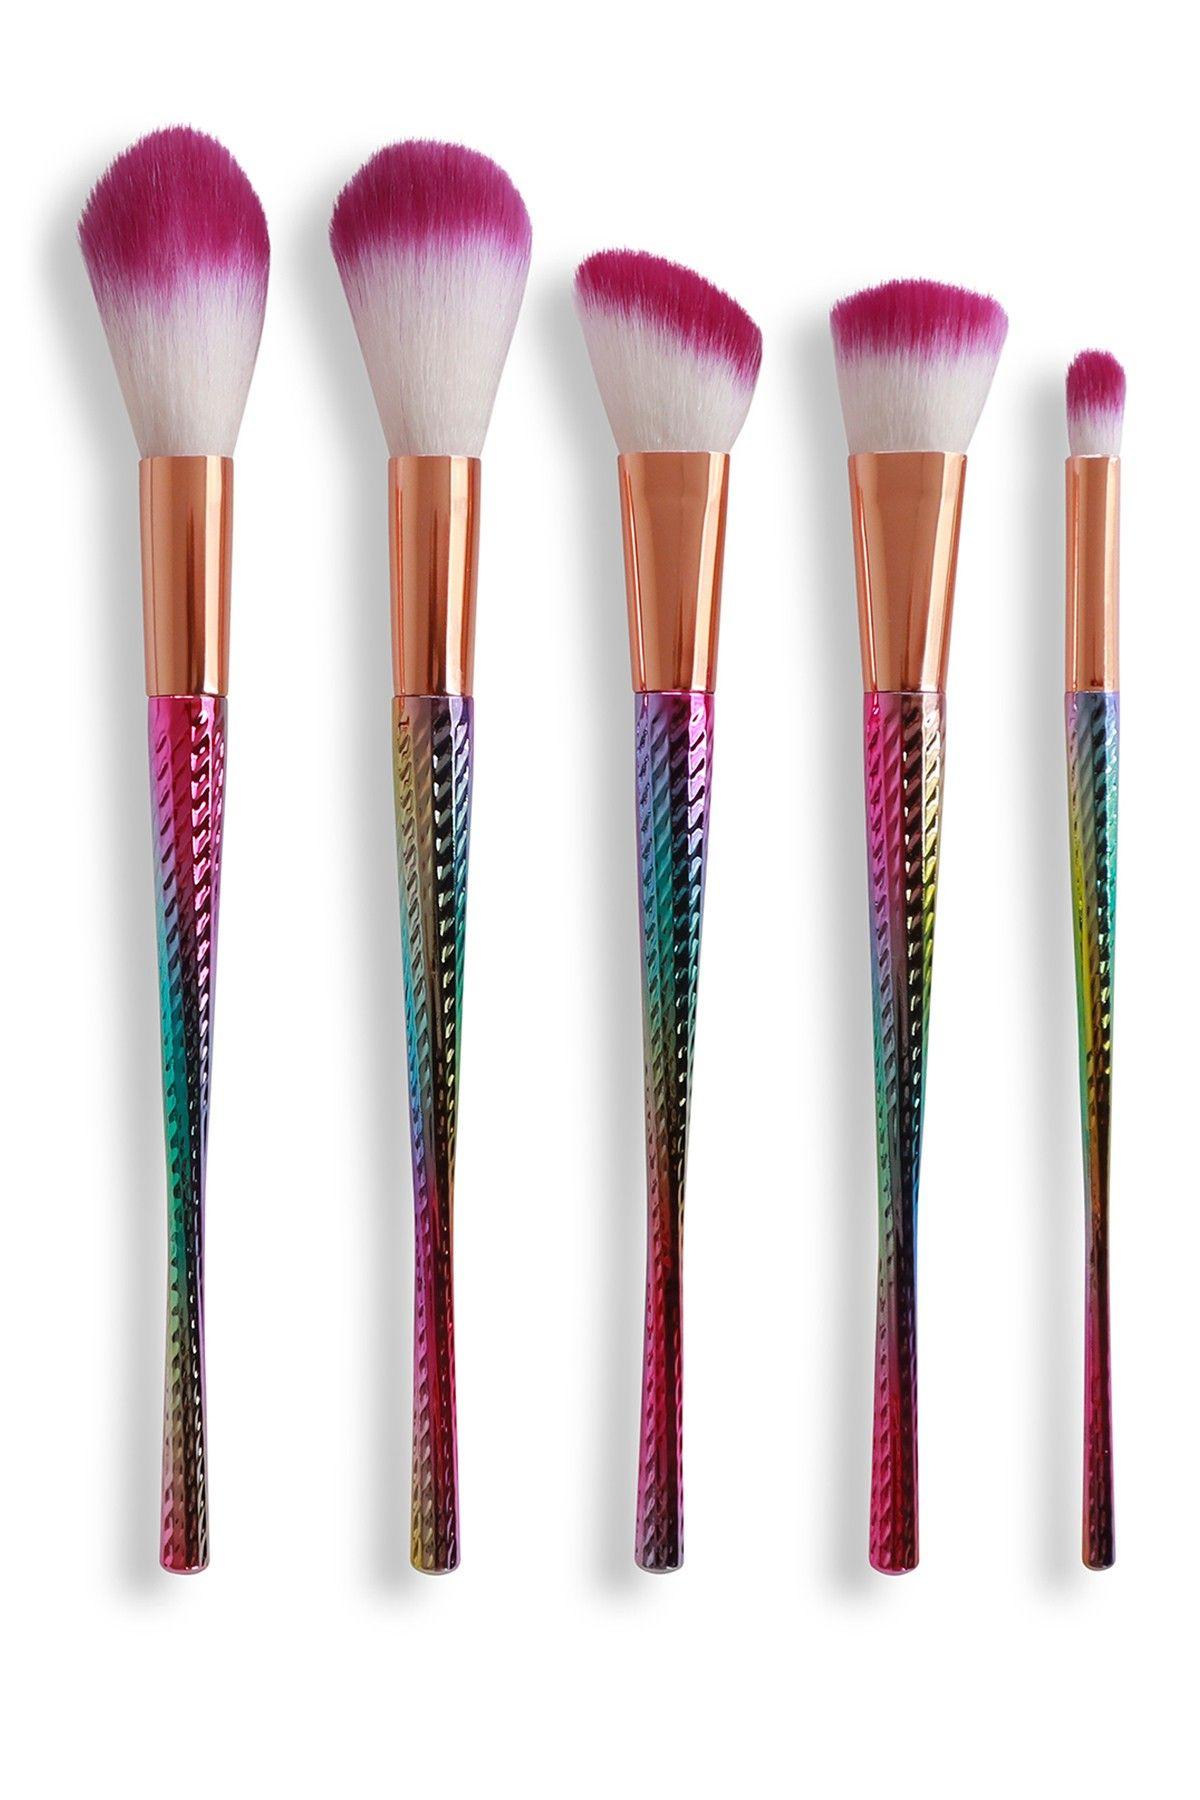 FaceBase Elegant 5Piece Makeup Brush Set Rainbow